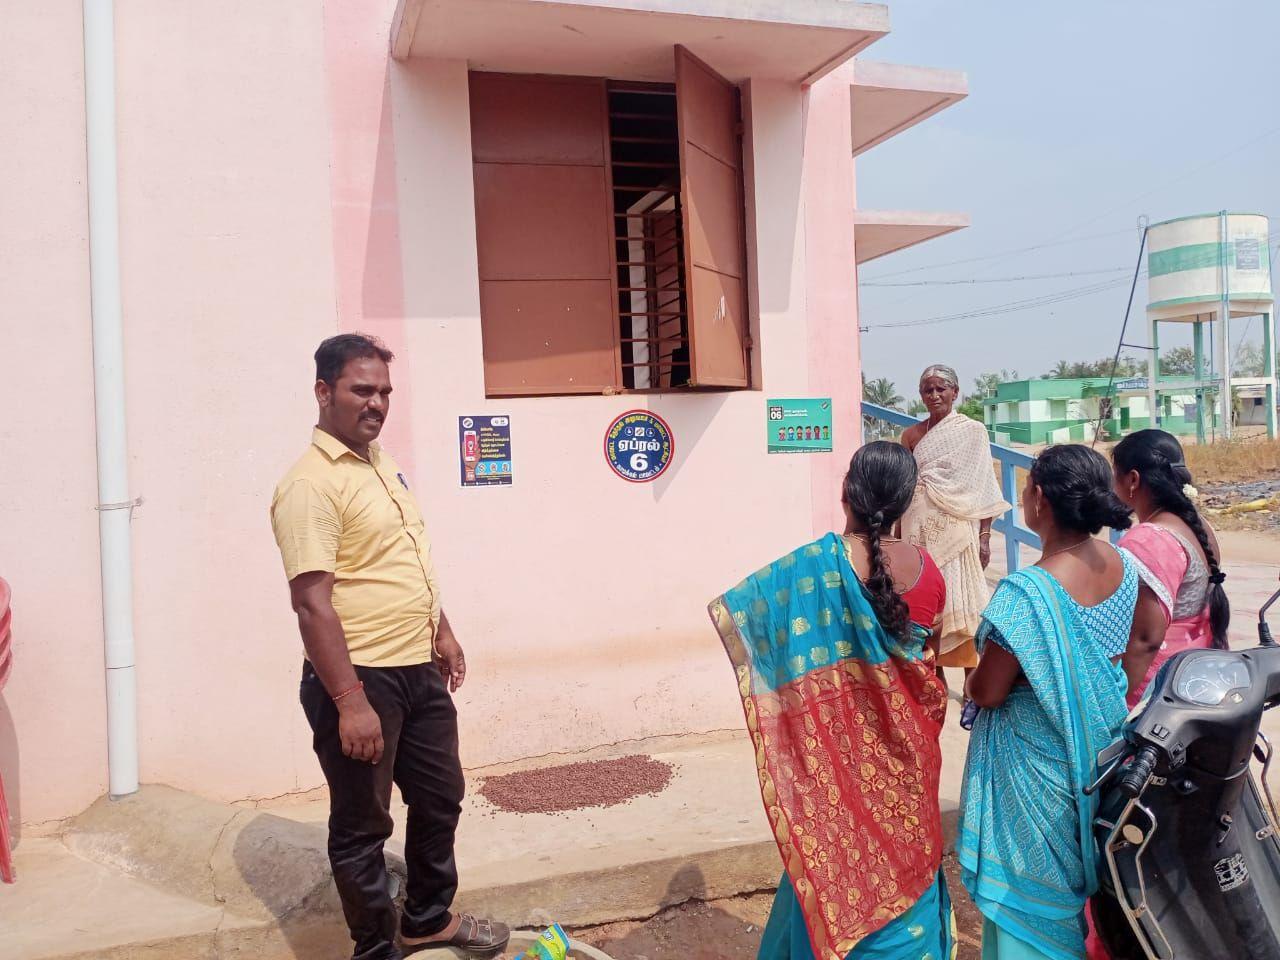 TNLA2021 - 96 Tiruchengode - Voters Awareness Programme - Noctice issued - Tiruchengode Block - On 01.04.2021 (2).jpeg